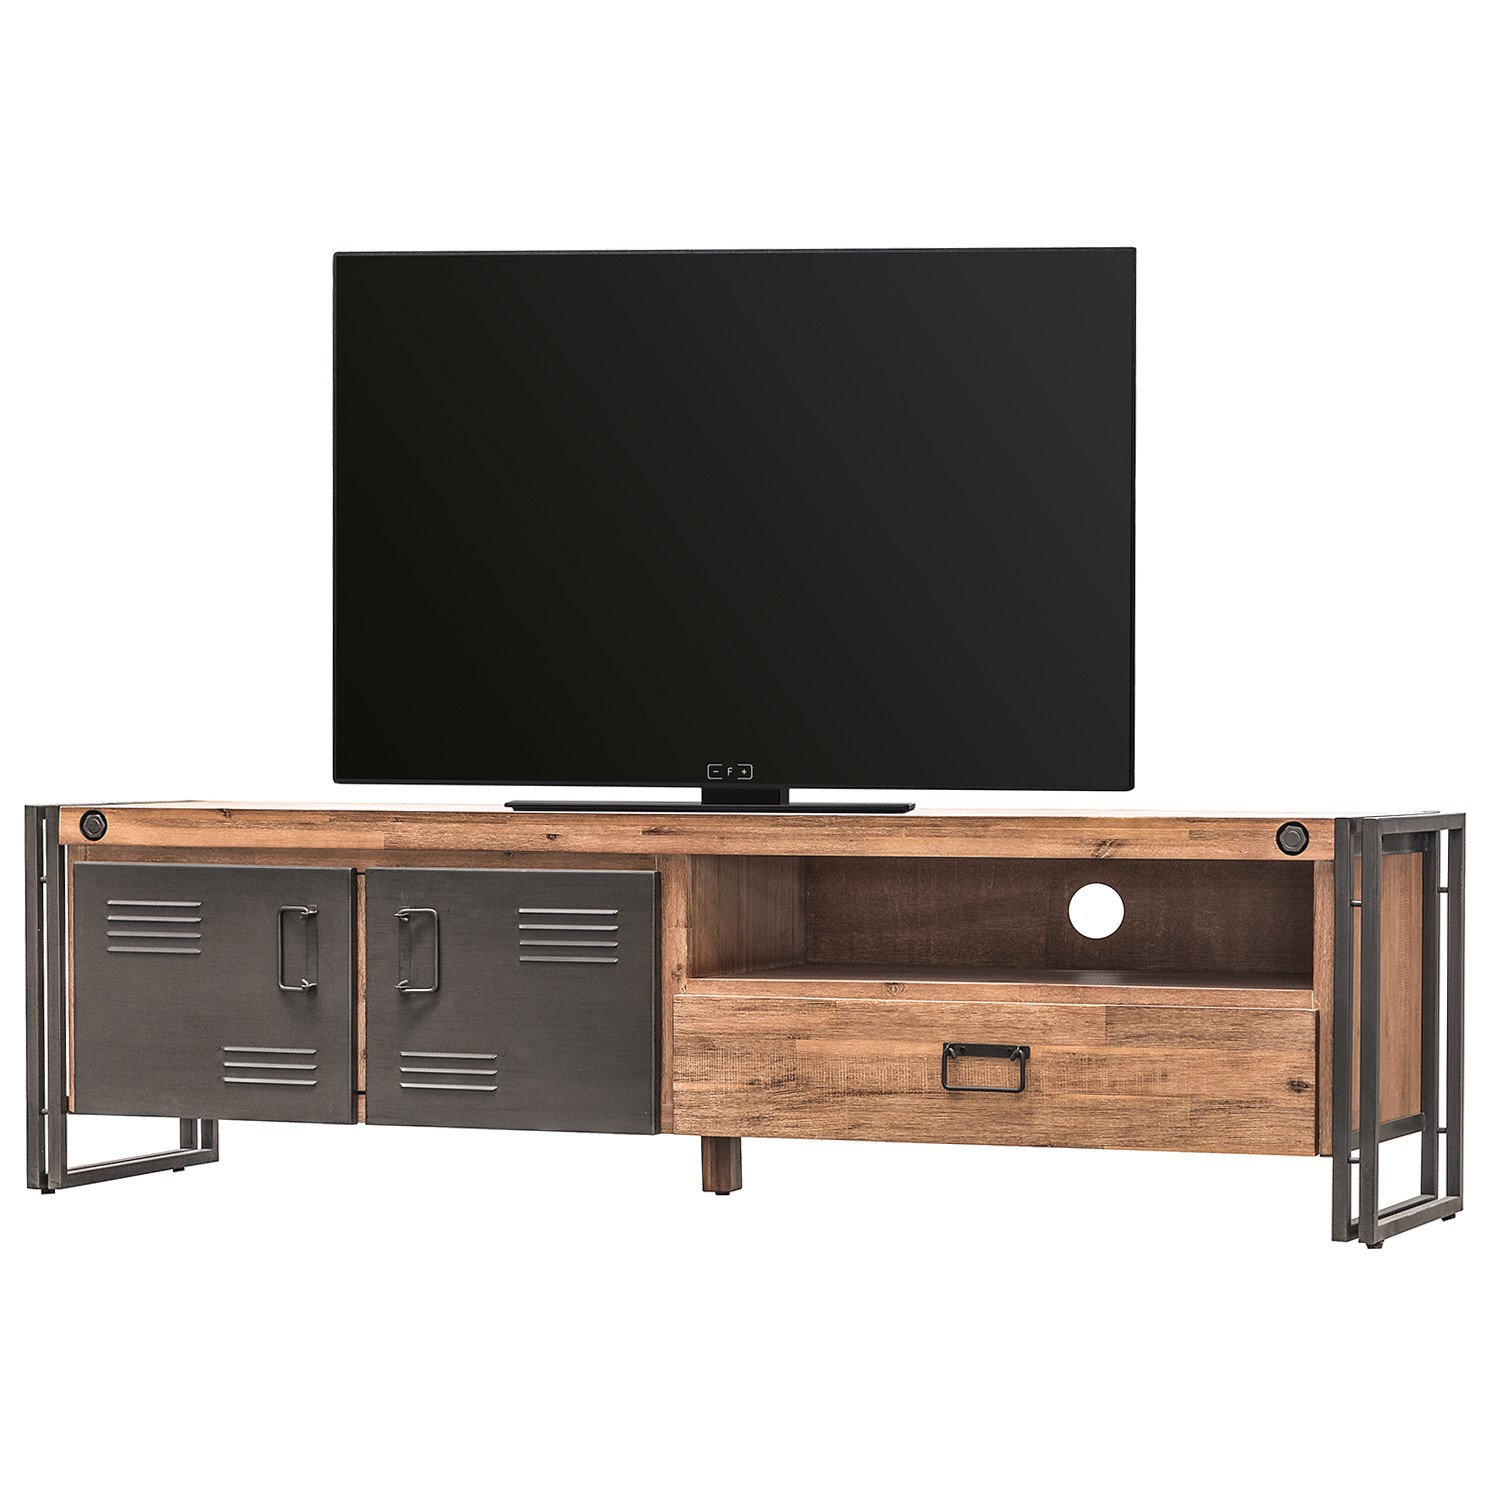 TV-Lowboard Manchester IV, ars manufacti